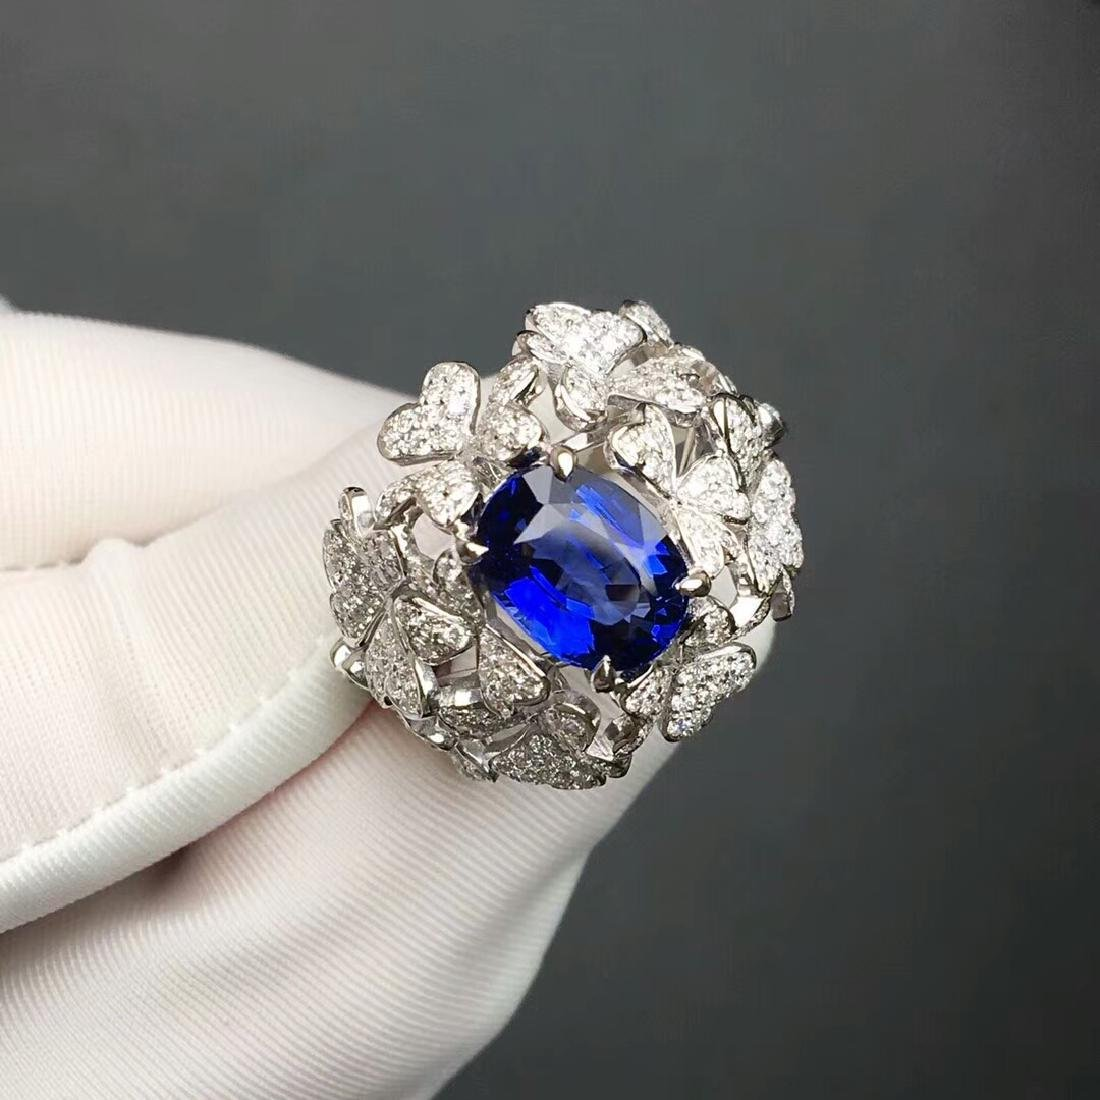 3.06 CTW Sapphire & VS Diamond Ring 18K